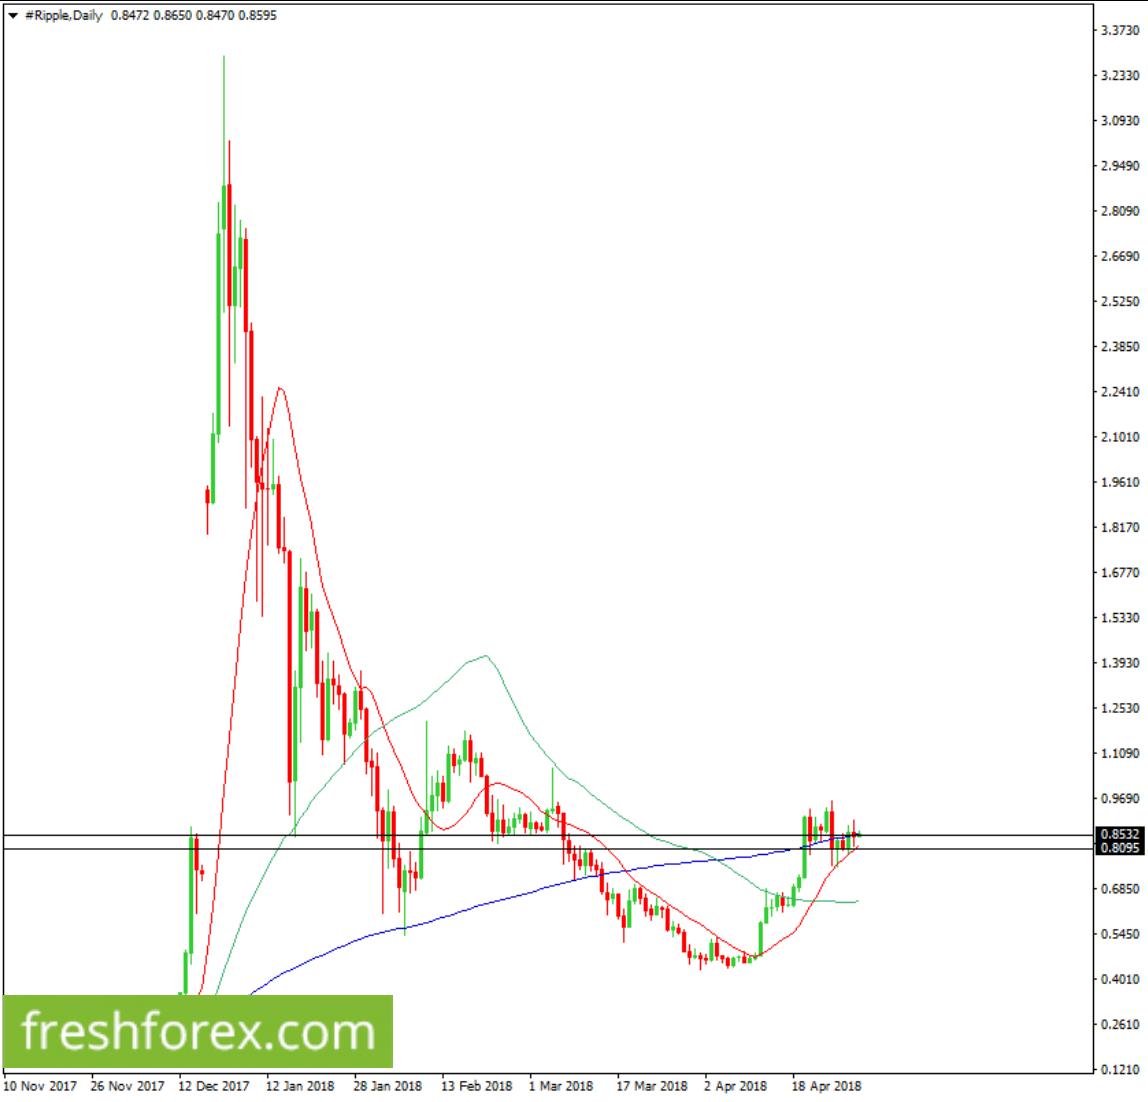 Long XRP now towards $3.0930